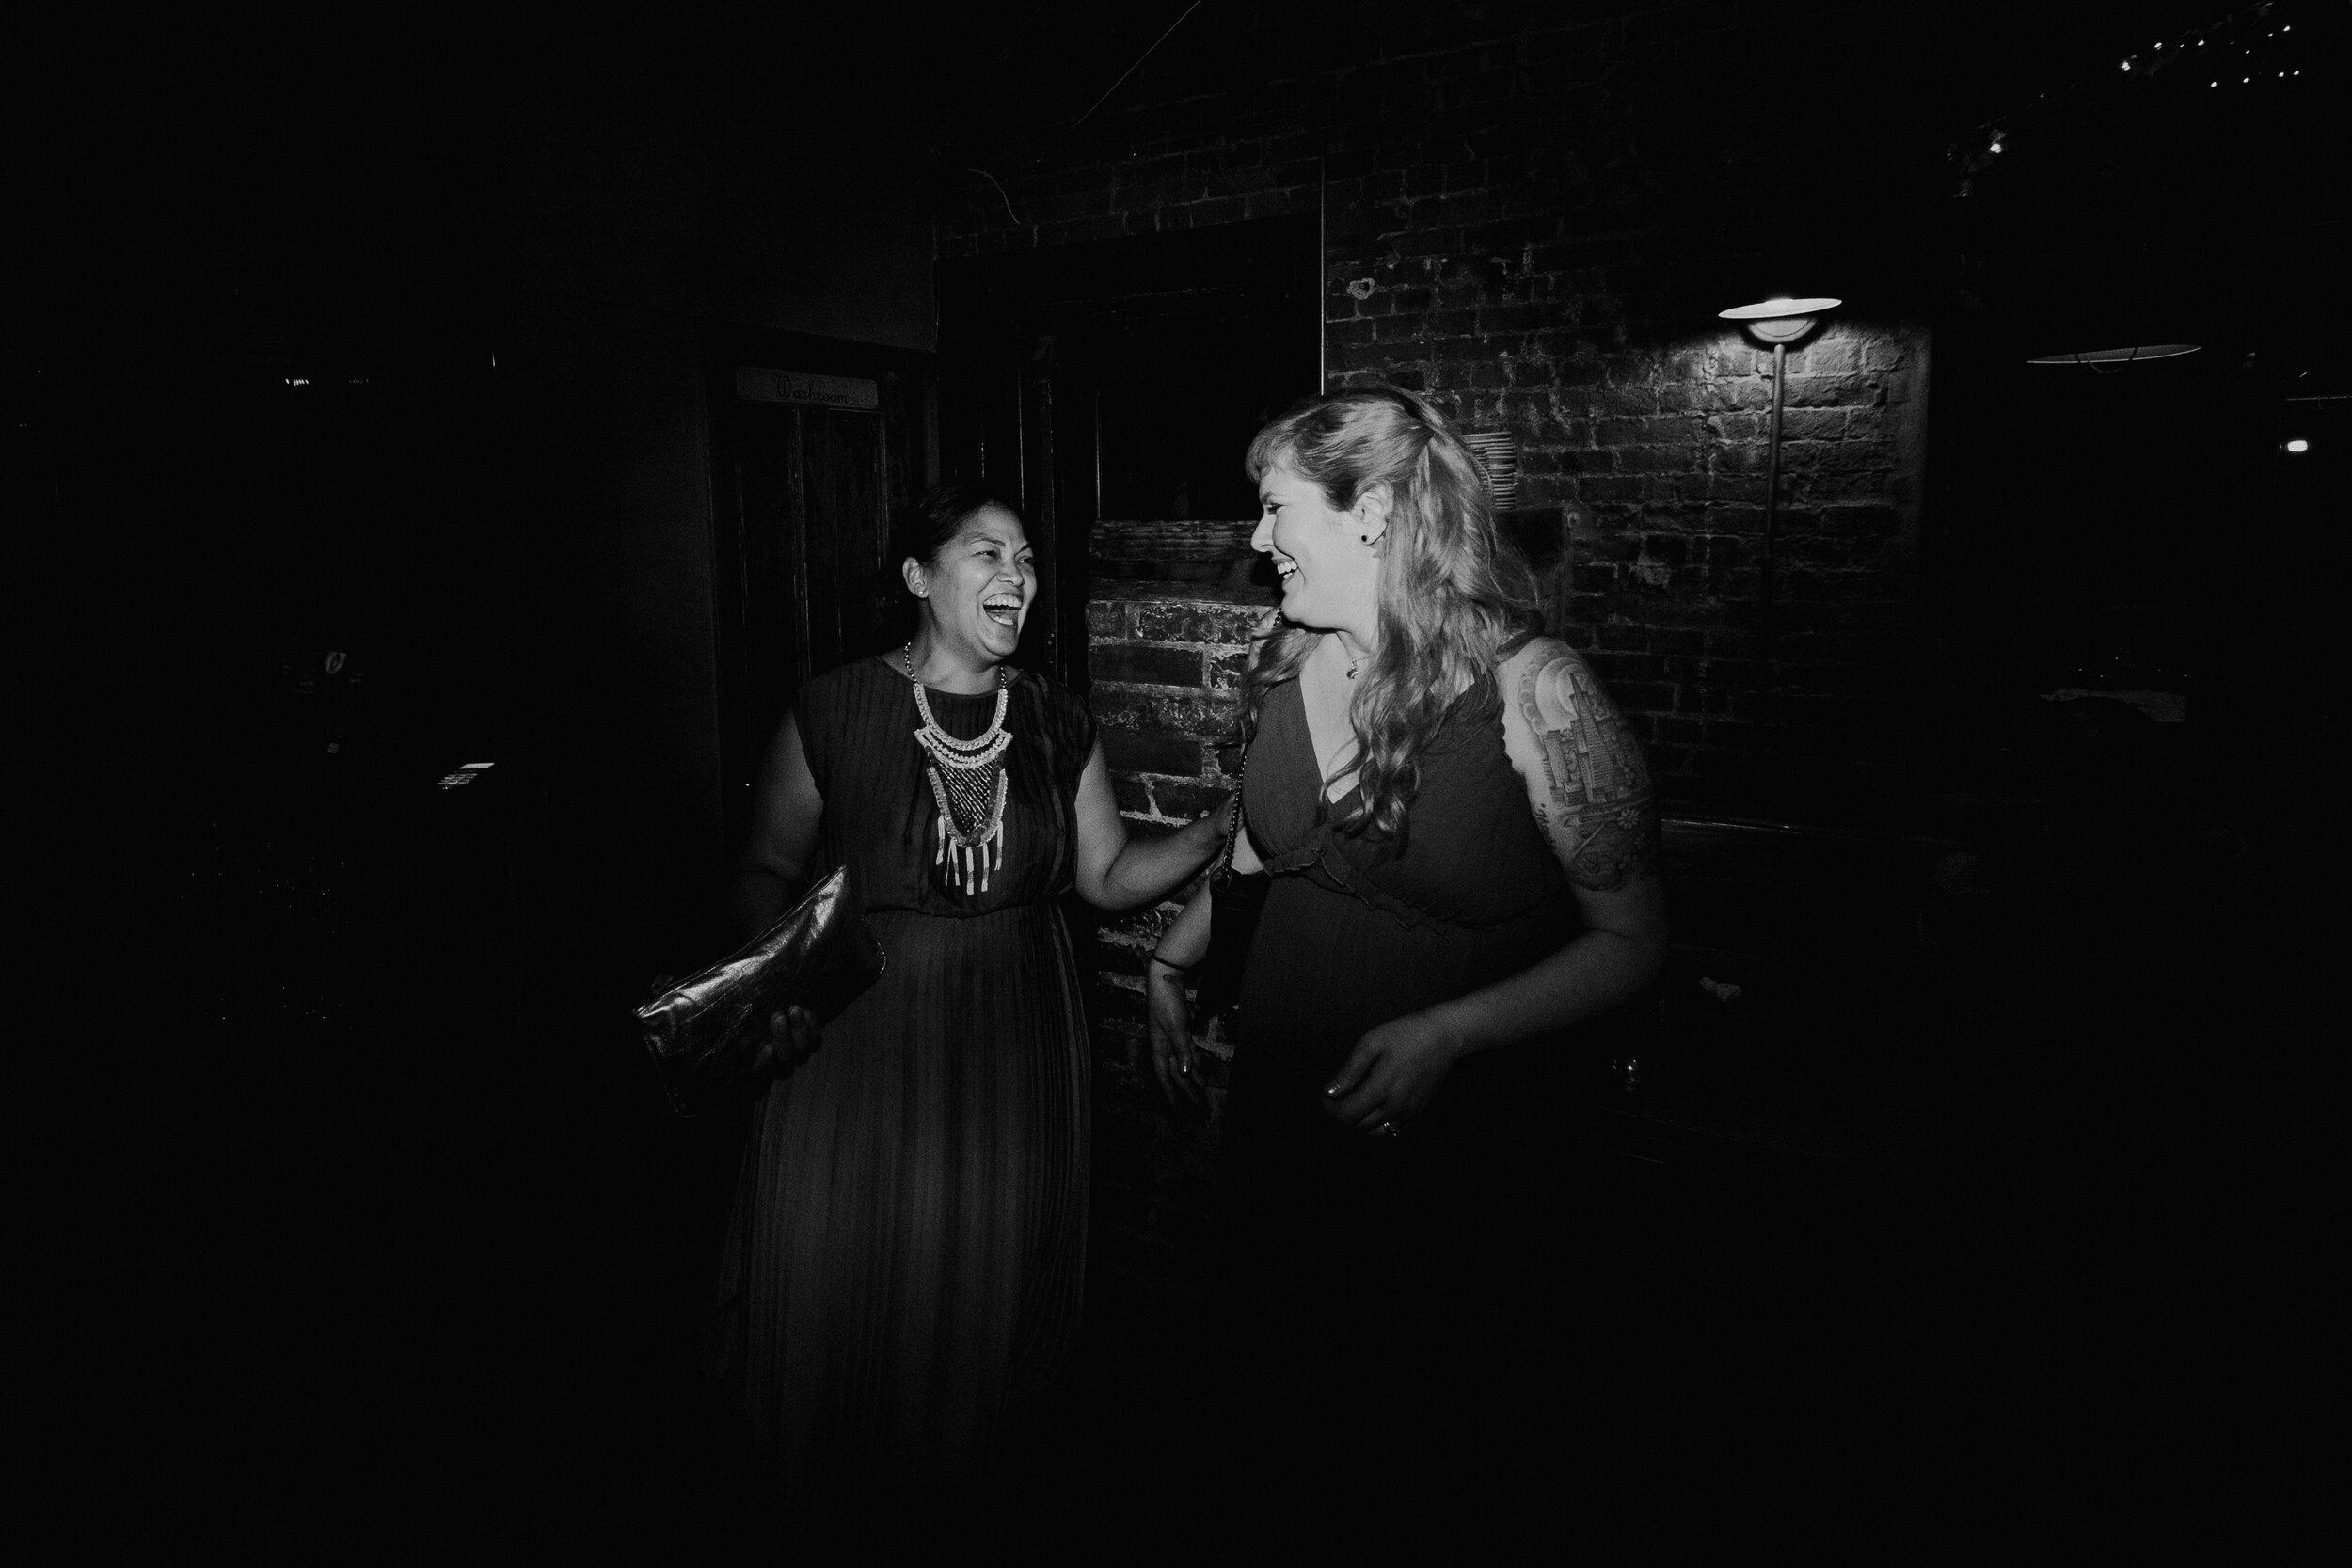 Aurora_Brooklyn_Wedding_Photographer_Chellise_Michael_Photography-579.jpg